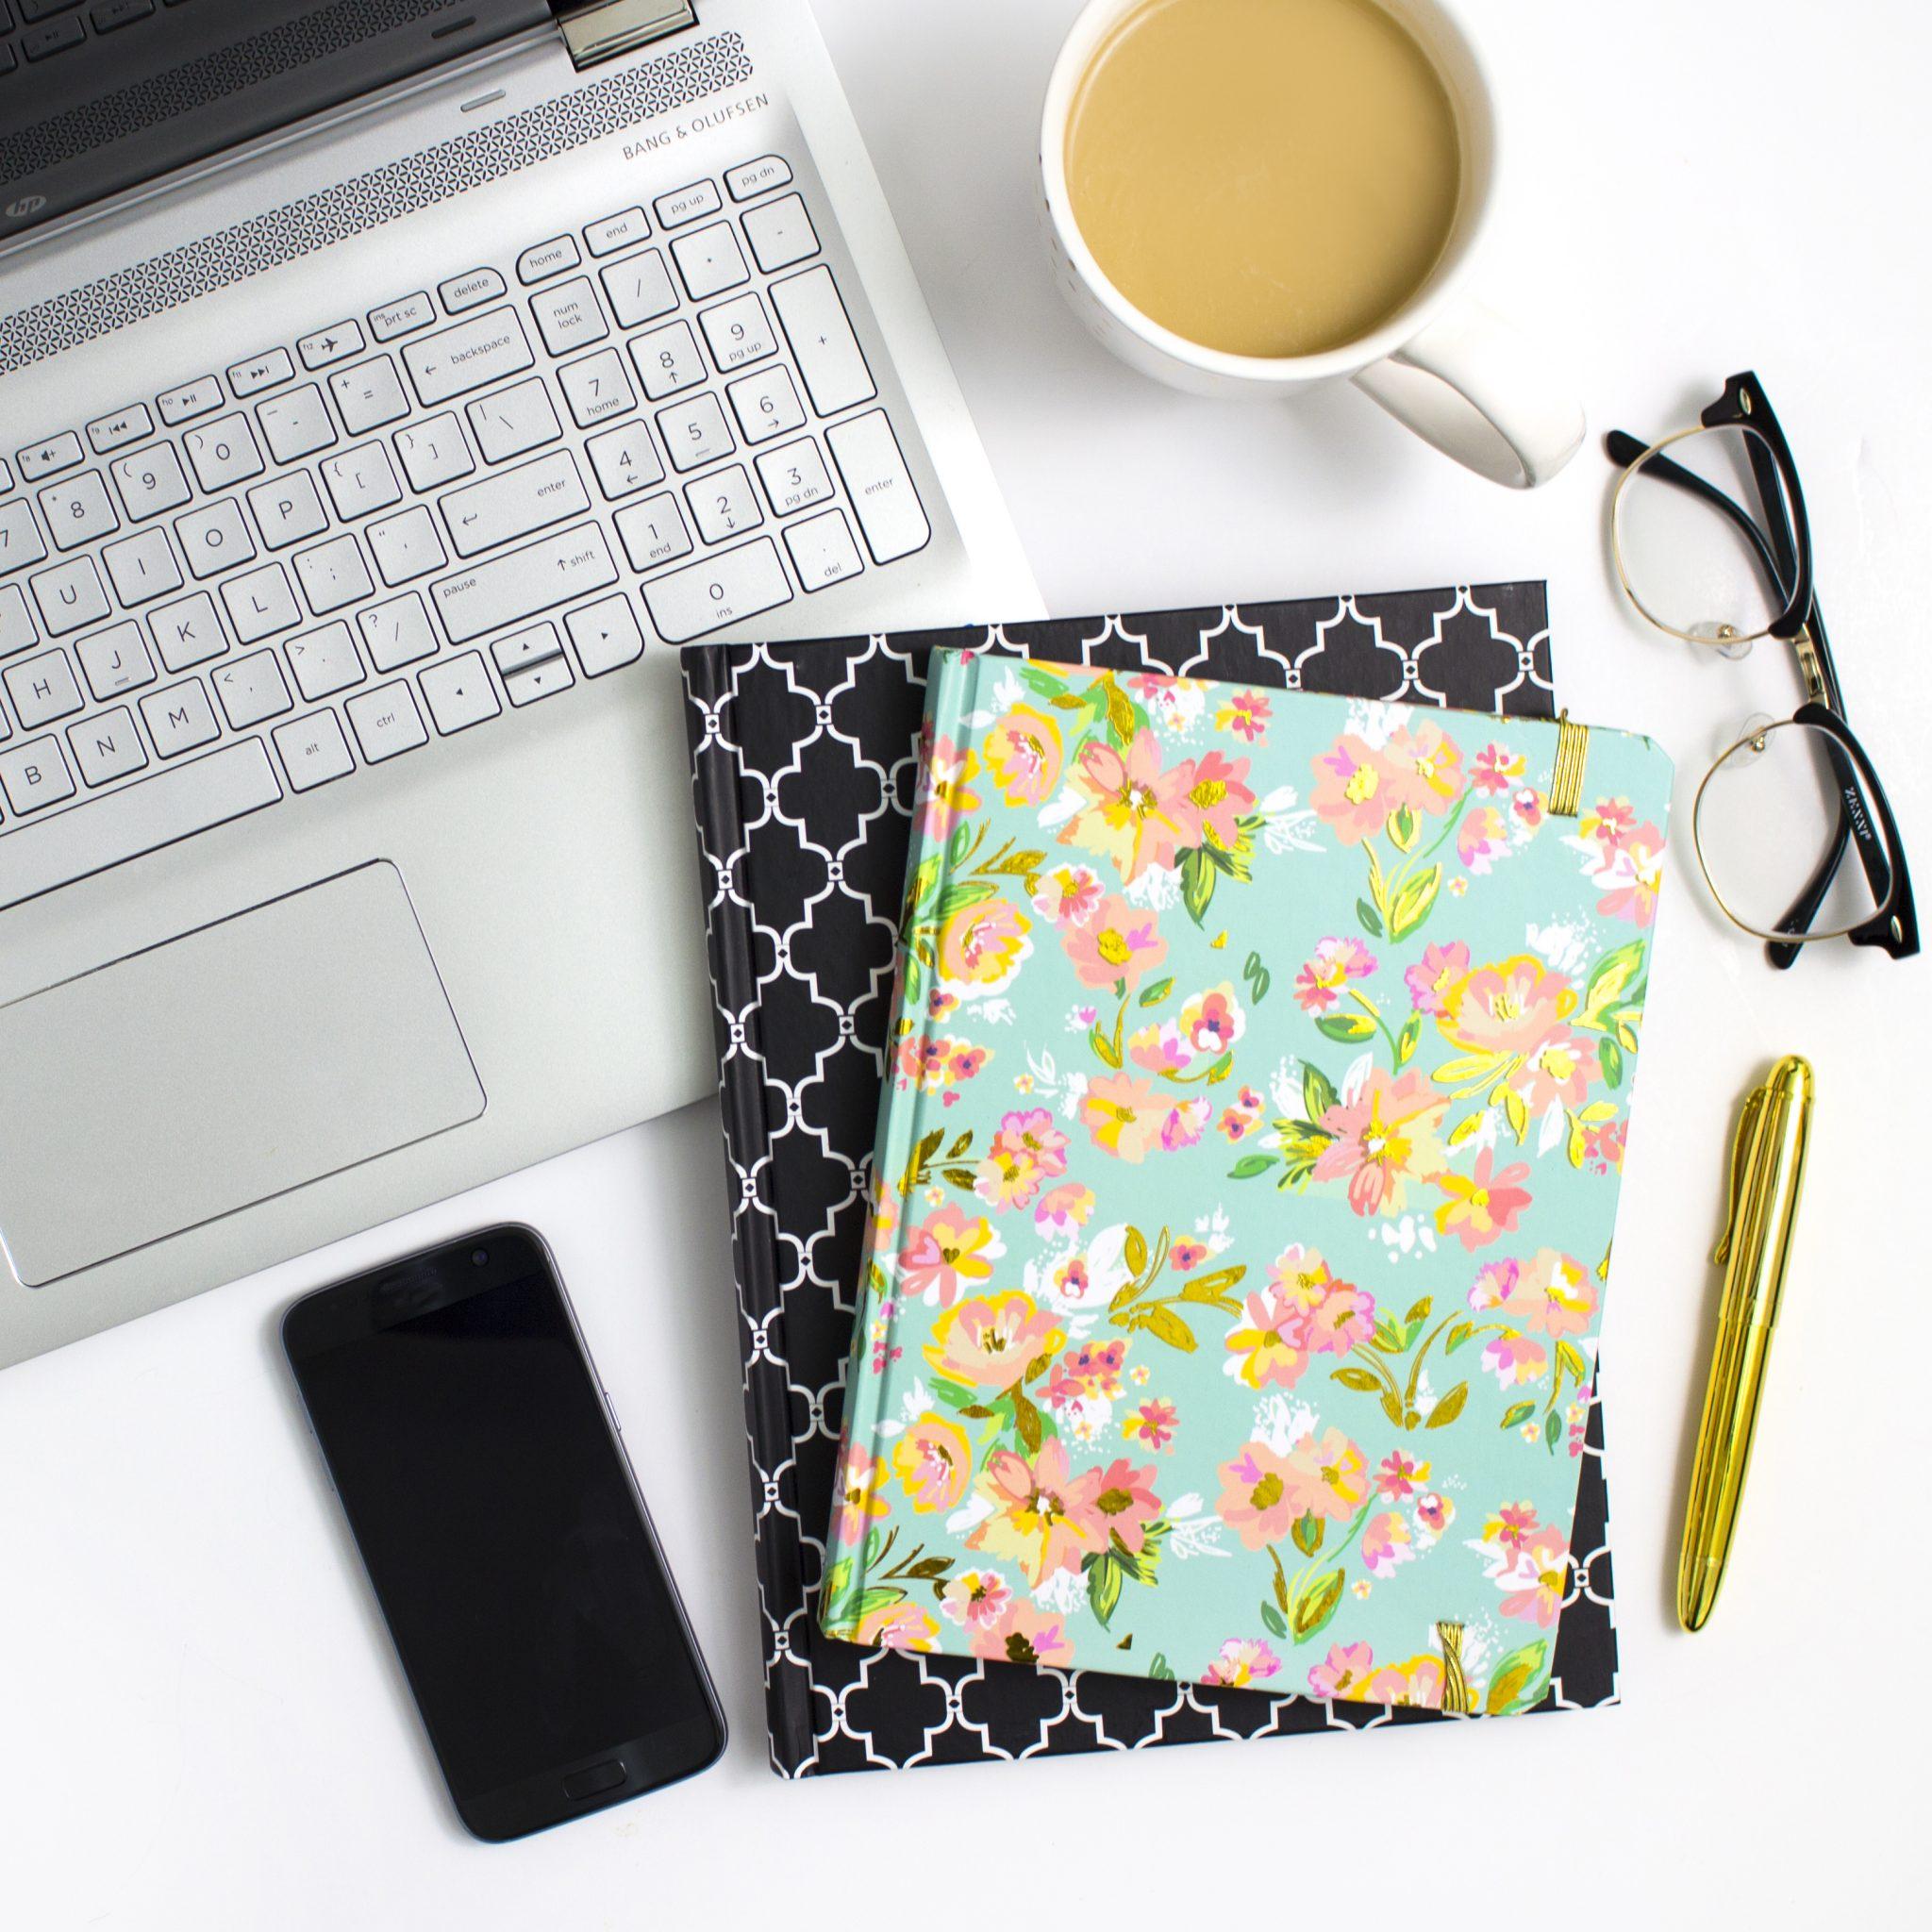 Basic Steps To Create Budget